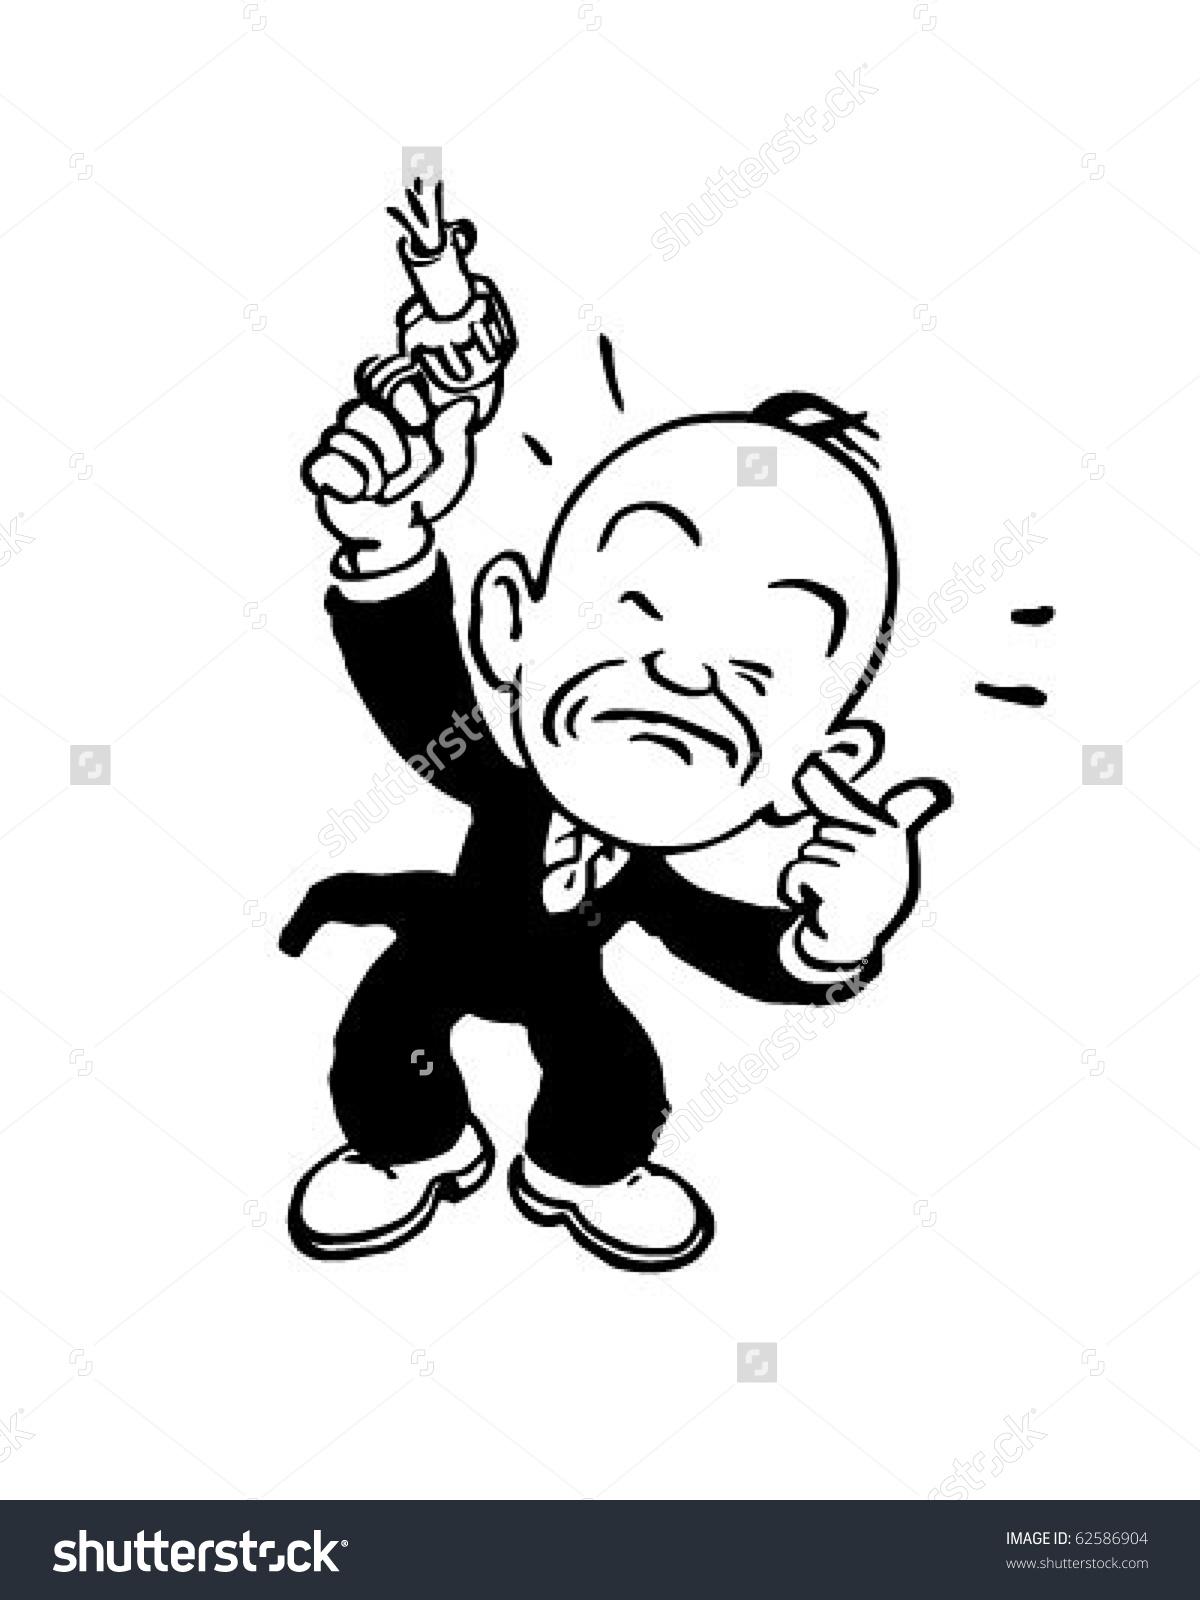 Funny Gun Clipart Clip art of Gun Clipart #1599 — Clipartwork.